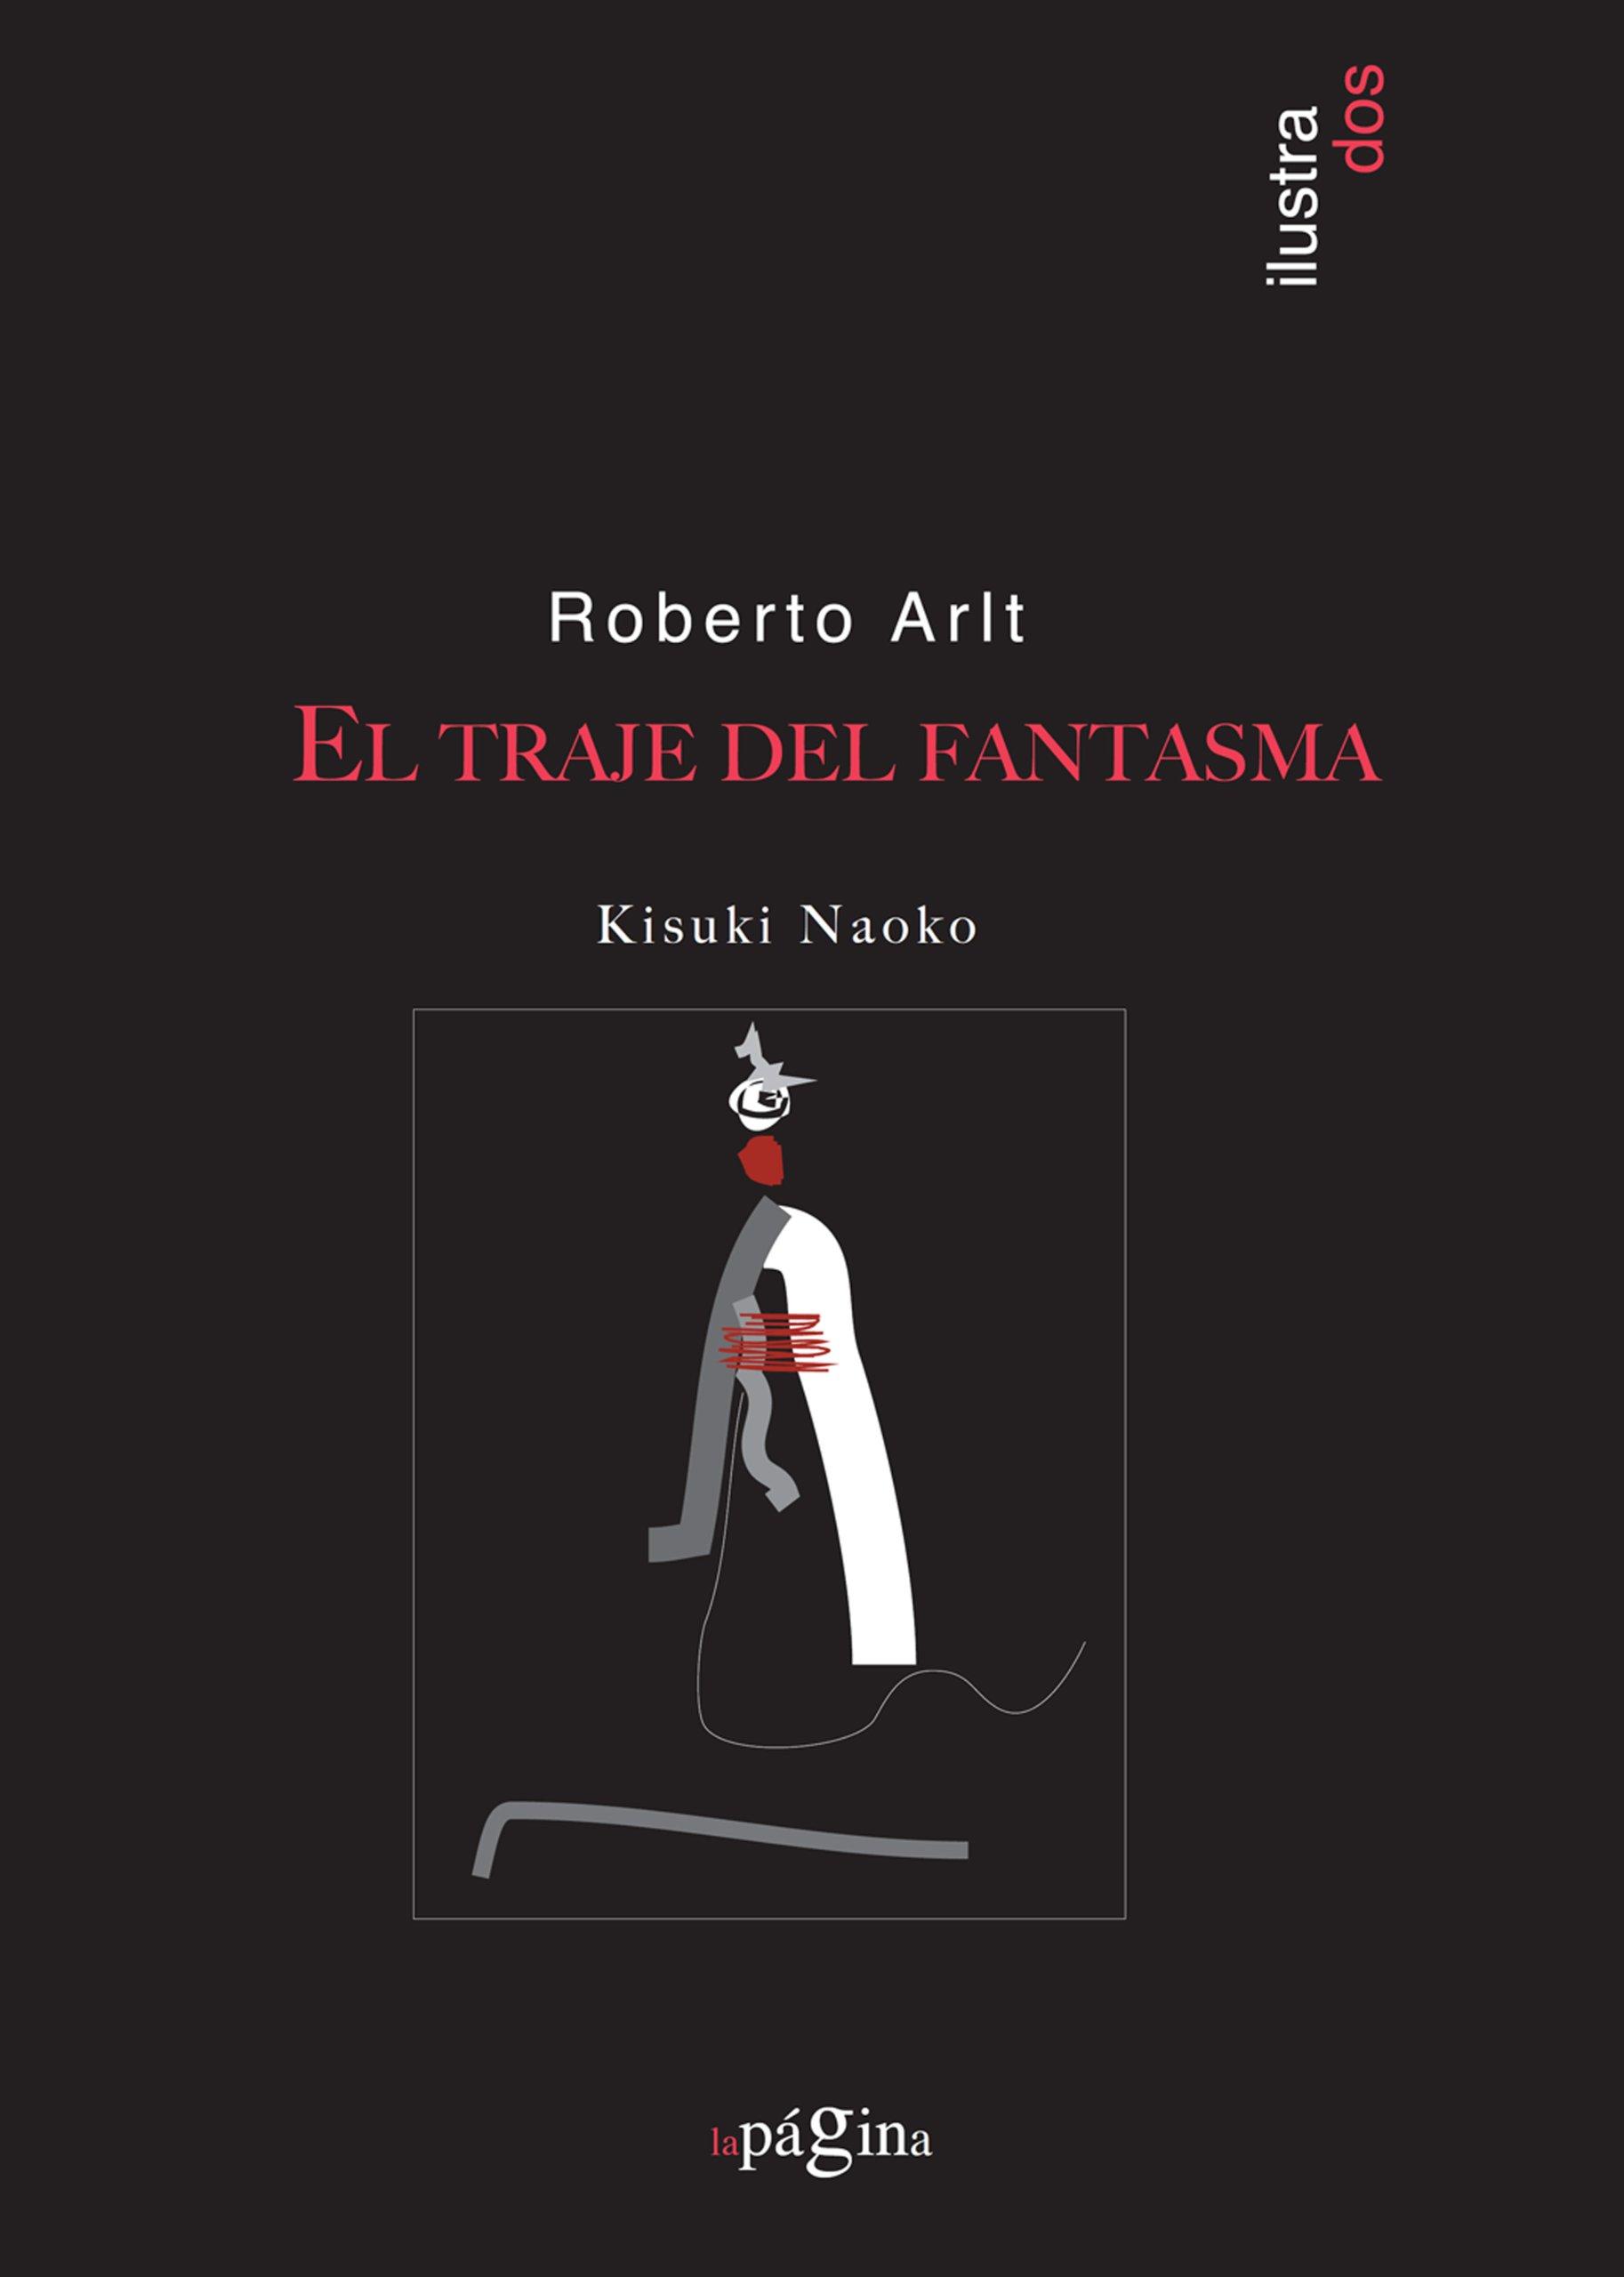 El Traje Del Fantasma (Ilustrados) (Spanish Edition) (Spanish) Paperback – July 24, 2012